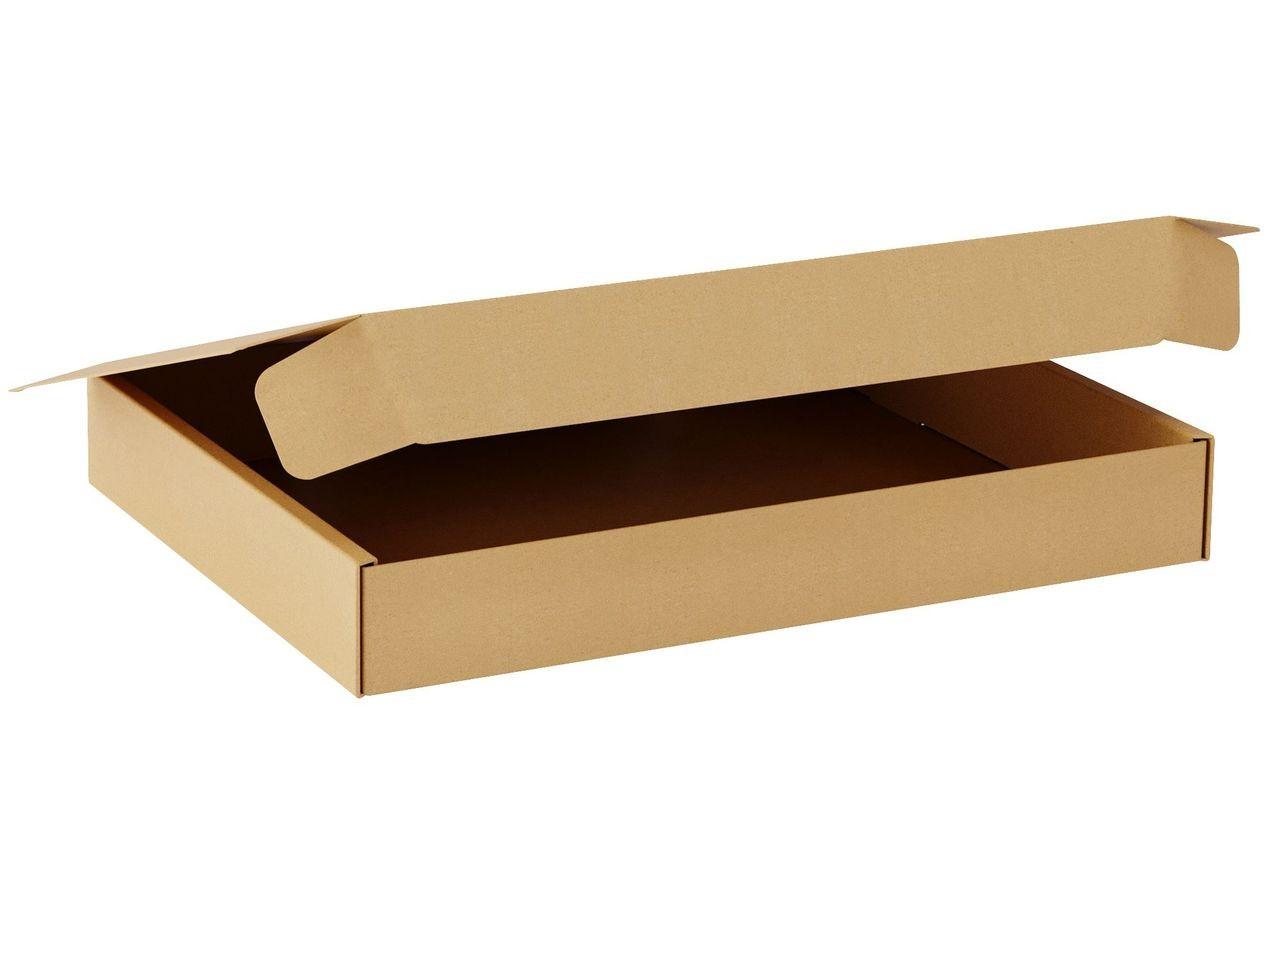 "TOTALPACK® 16 x 11 1/2 x 2 1/2"" Single Wall Corrugated Boxes ""Interlock Die-Cut"" 25 Units"